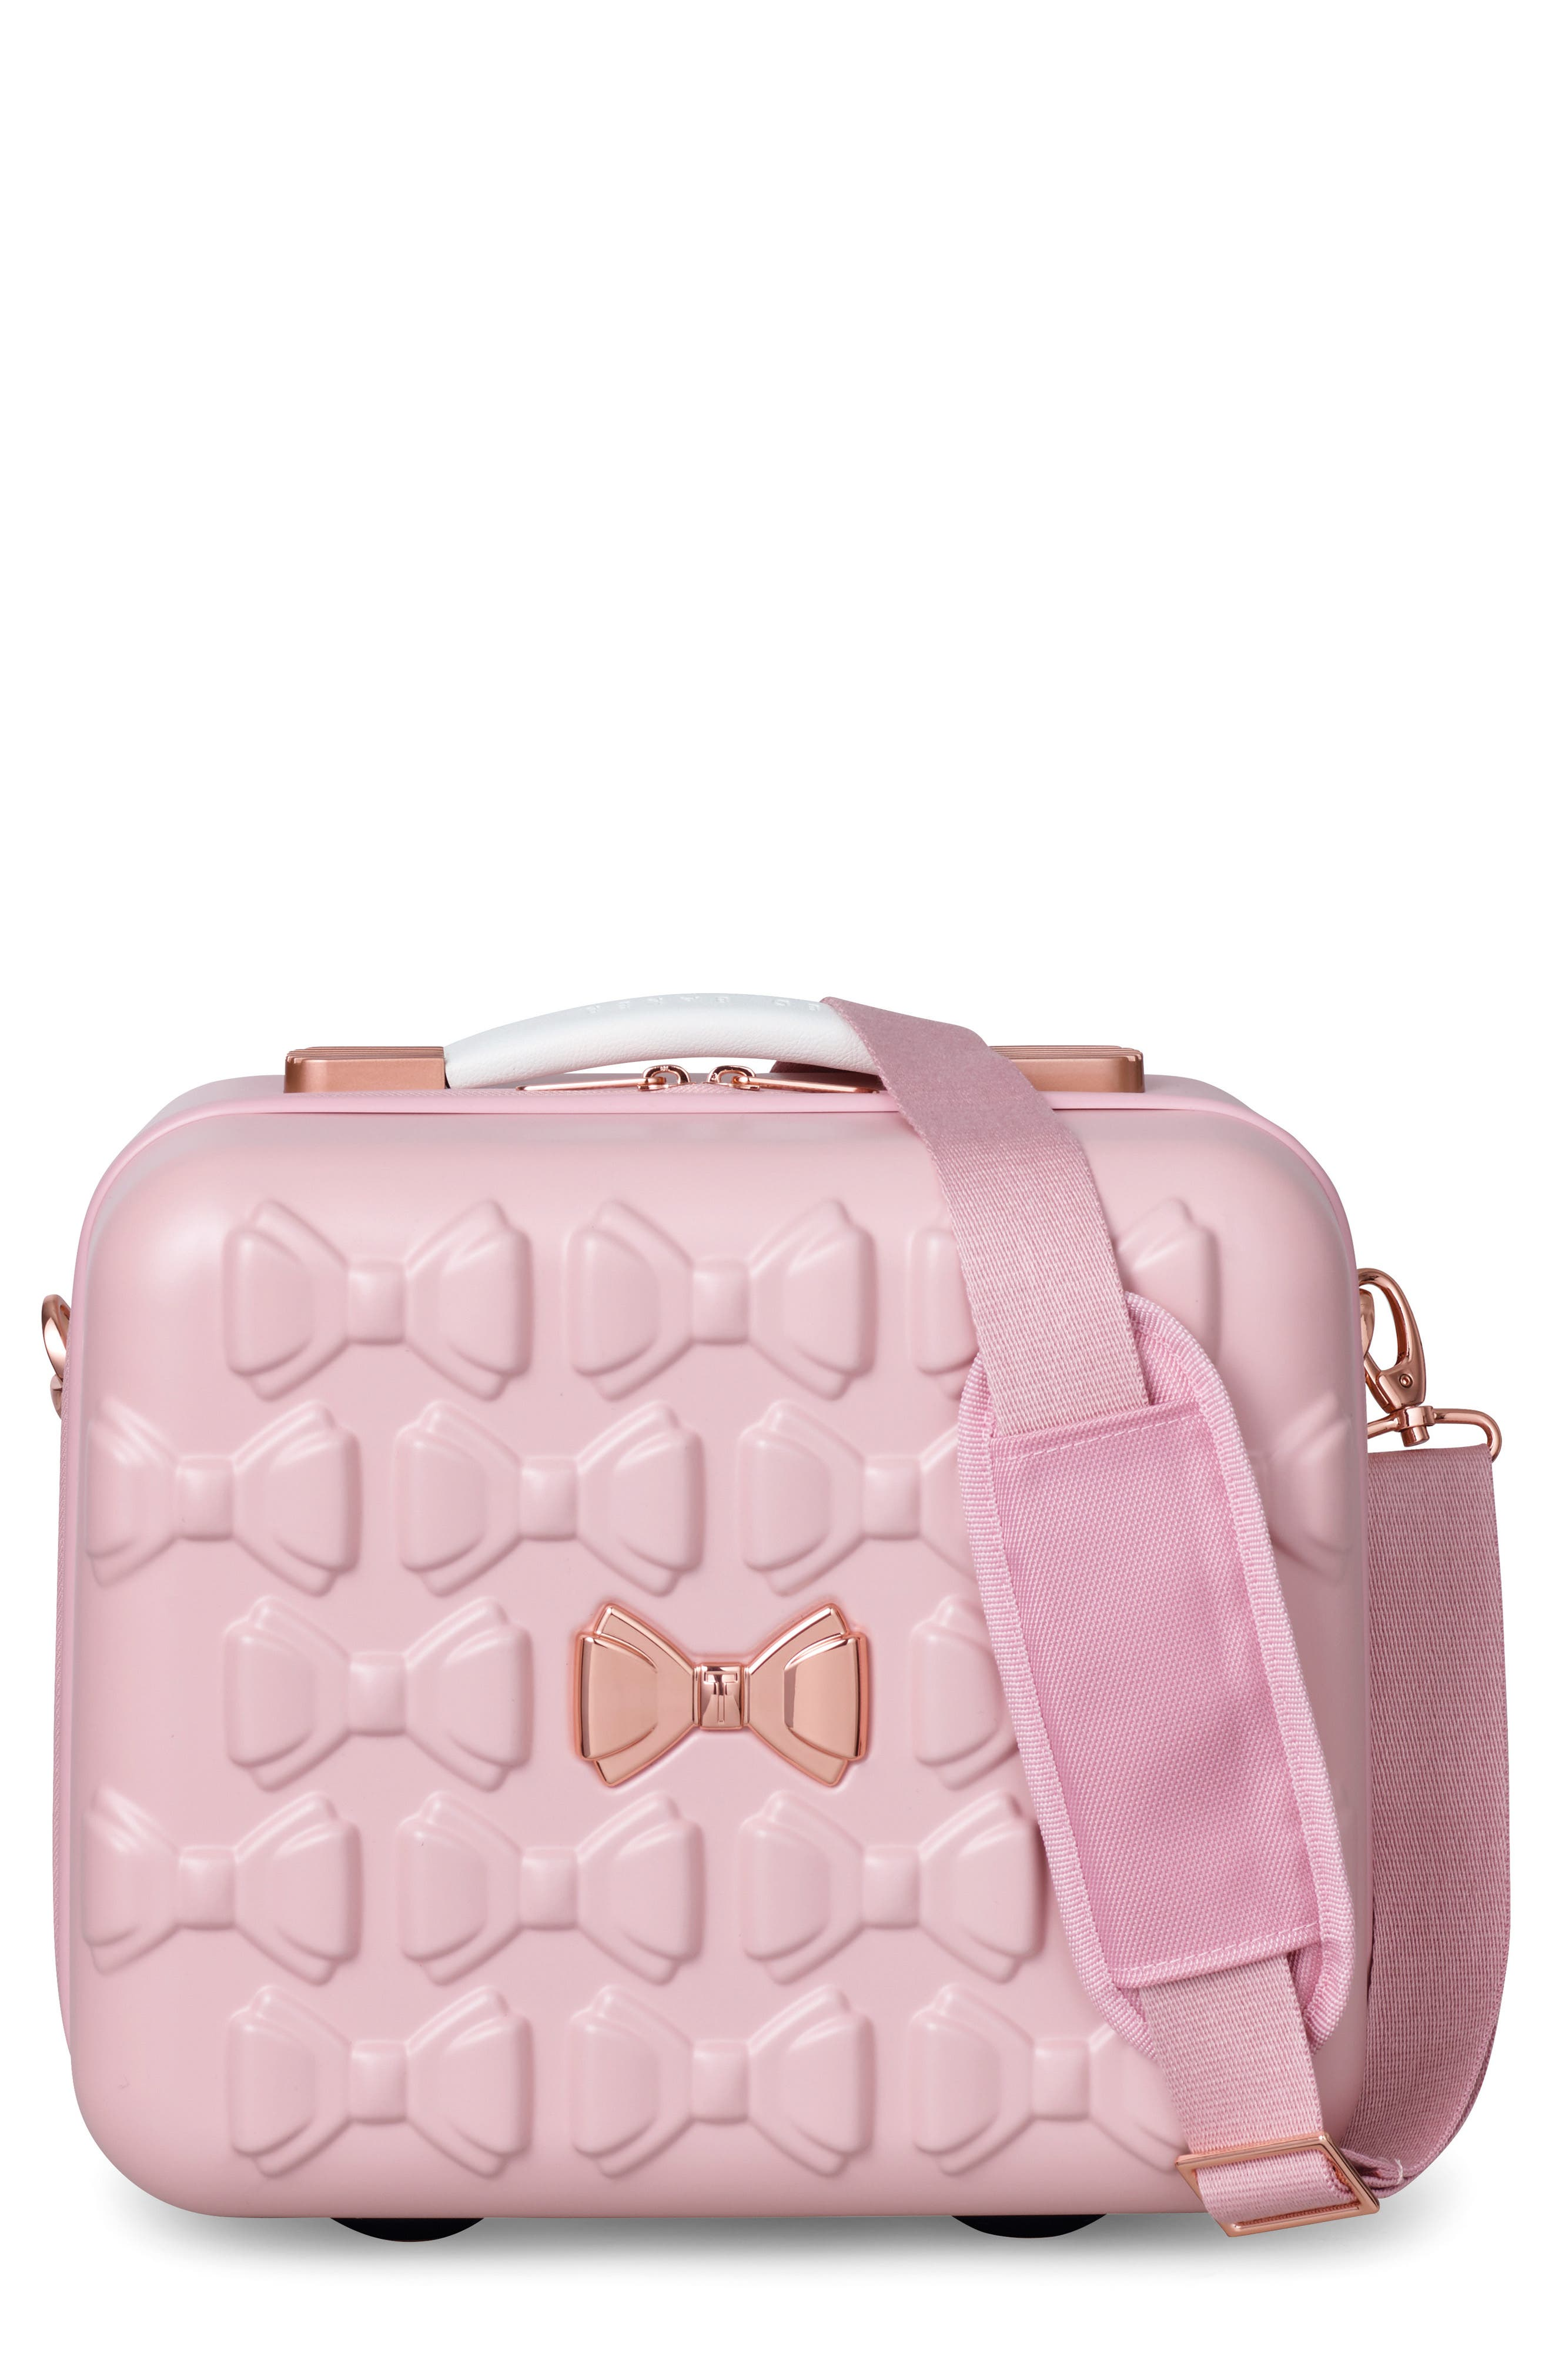 Beau Hardshell Vanity Case,                             Main thumbnail 1, color,                             Pink